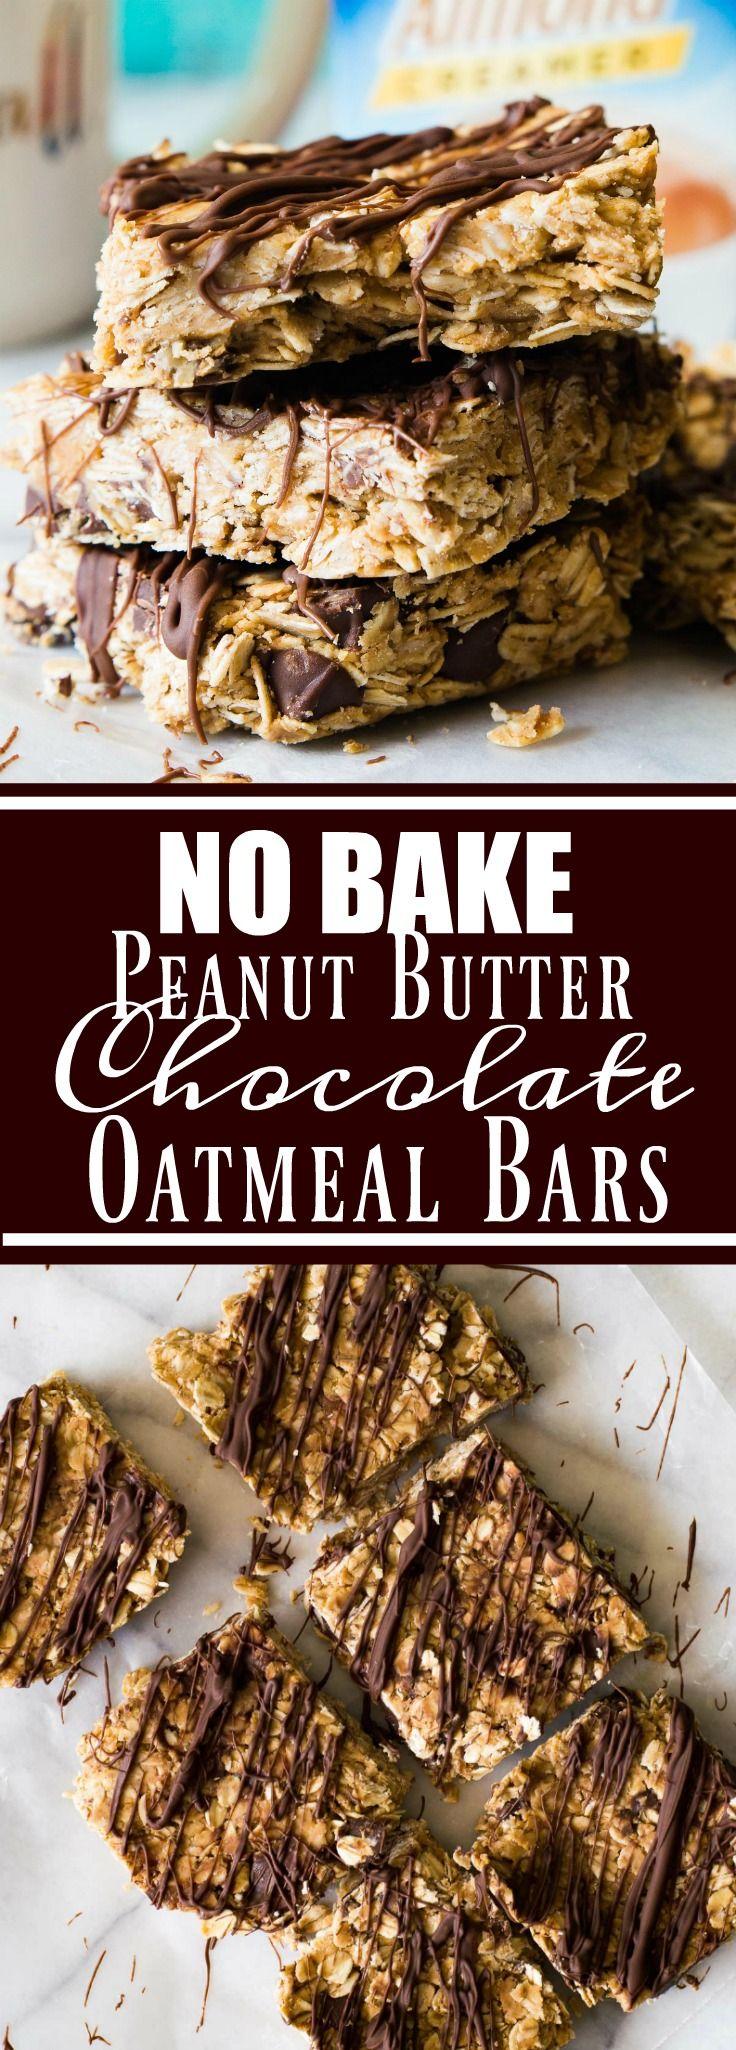 {No Bake} Peanut Butter Chocolate Oatmeal Bars